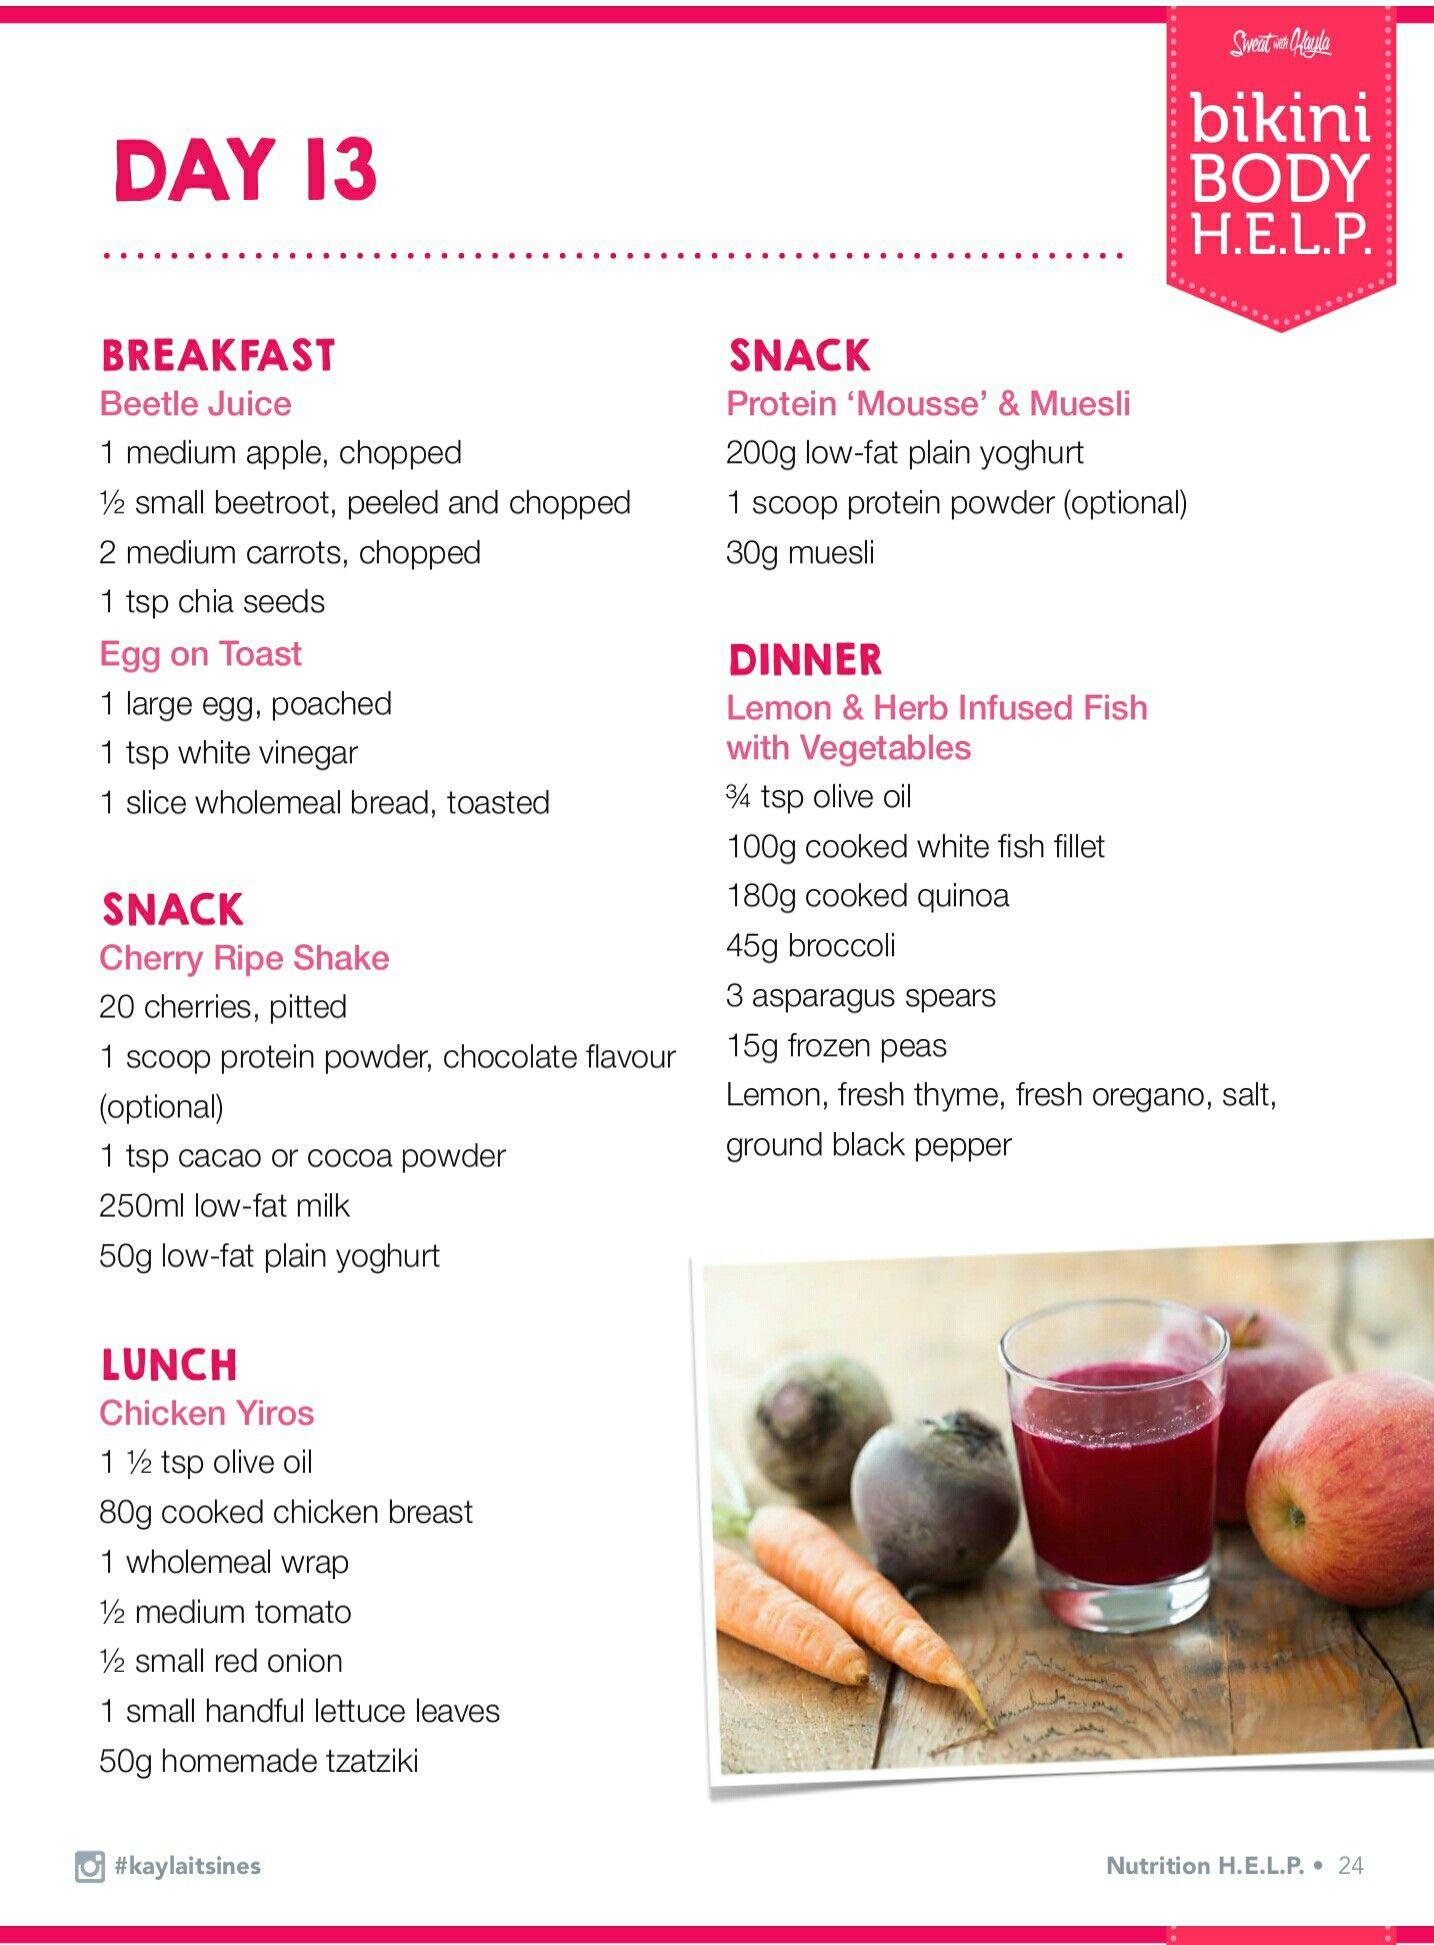 Pin By Jess Henry On Recipes Get Fit Eat Clean Bbg Kayla Itsines Nutrition Kayla Itsines Meal Plan Nutrition